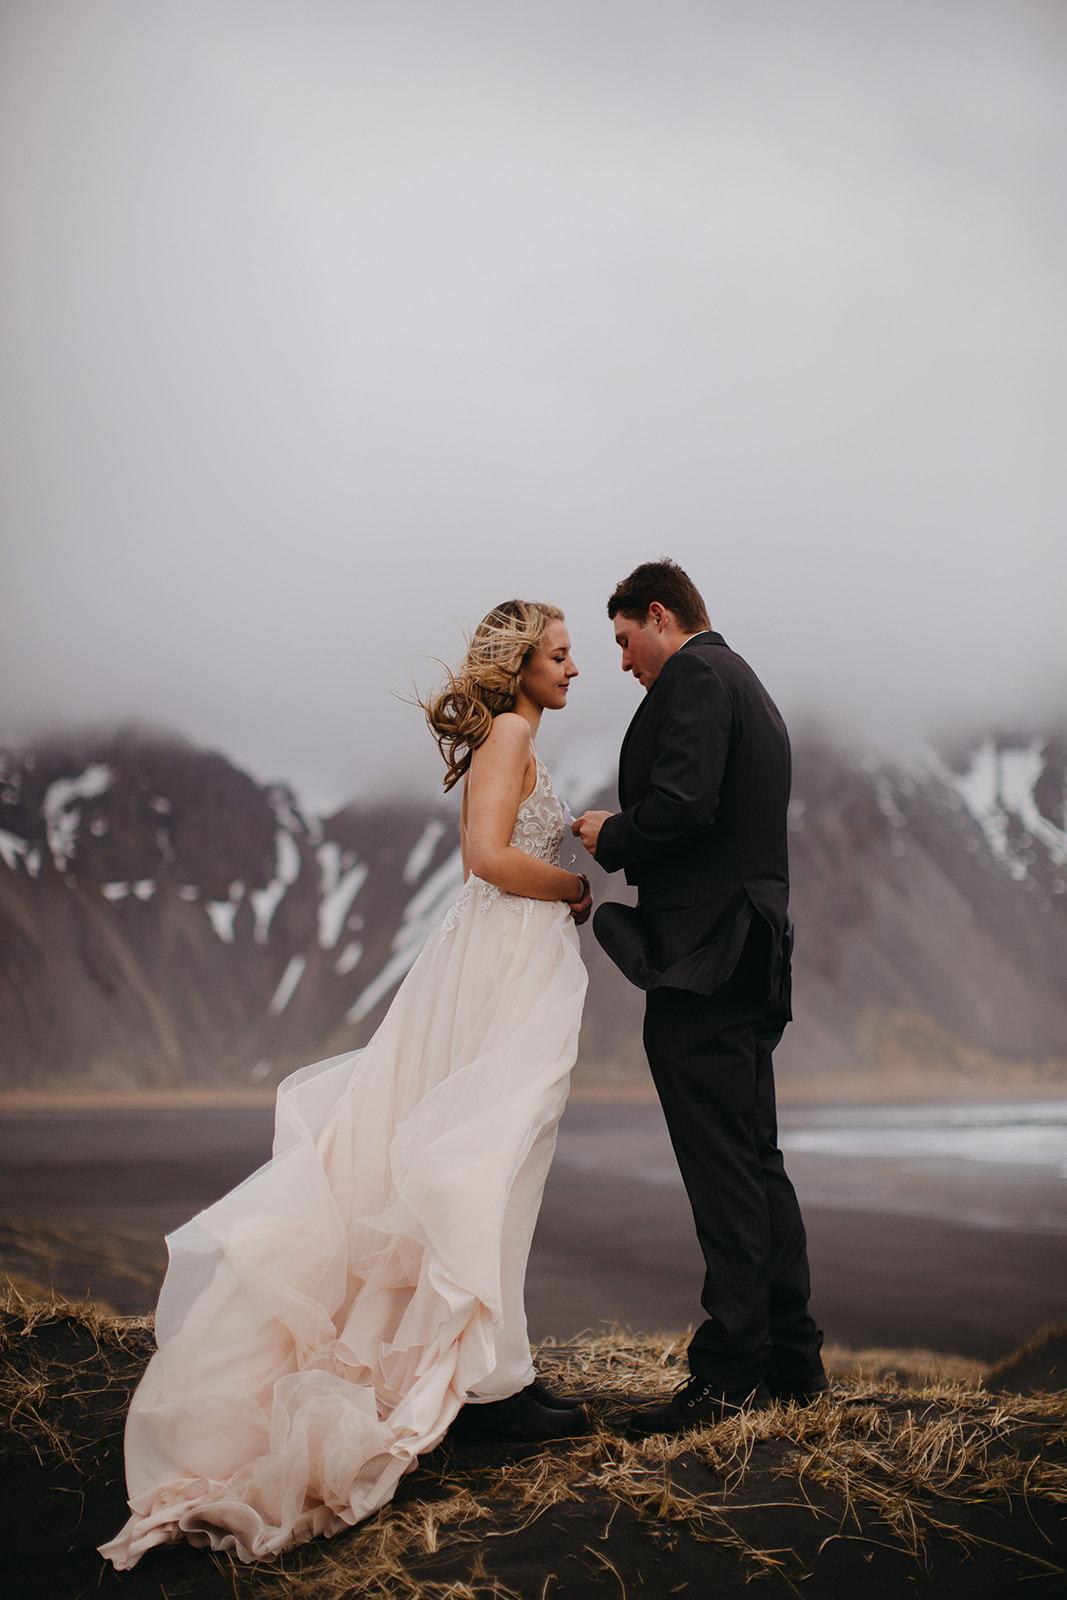 Icelandic Iceland Elopement Wedding Elope Photographer Eloping Reykjavík Vik Black Sand Beach Jökulsárlón Skogafoss Waterfall Vestrahorn Mountain Liz Osban Photography Destination 22.jpg